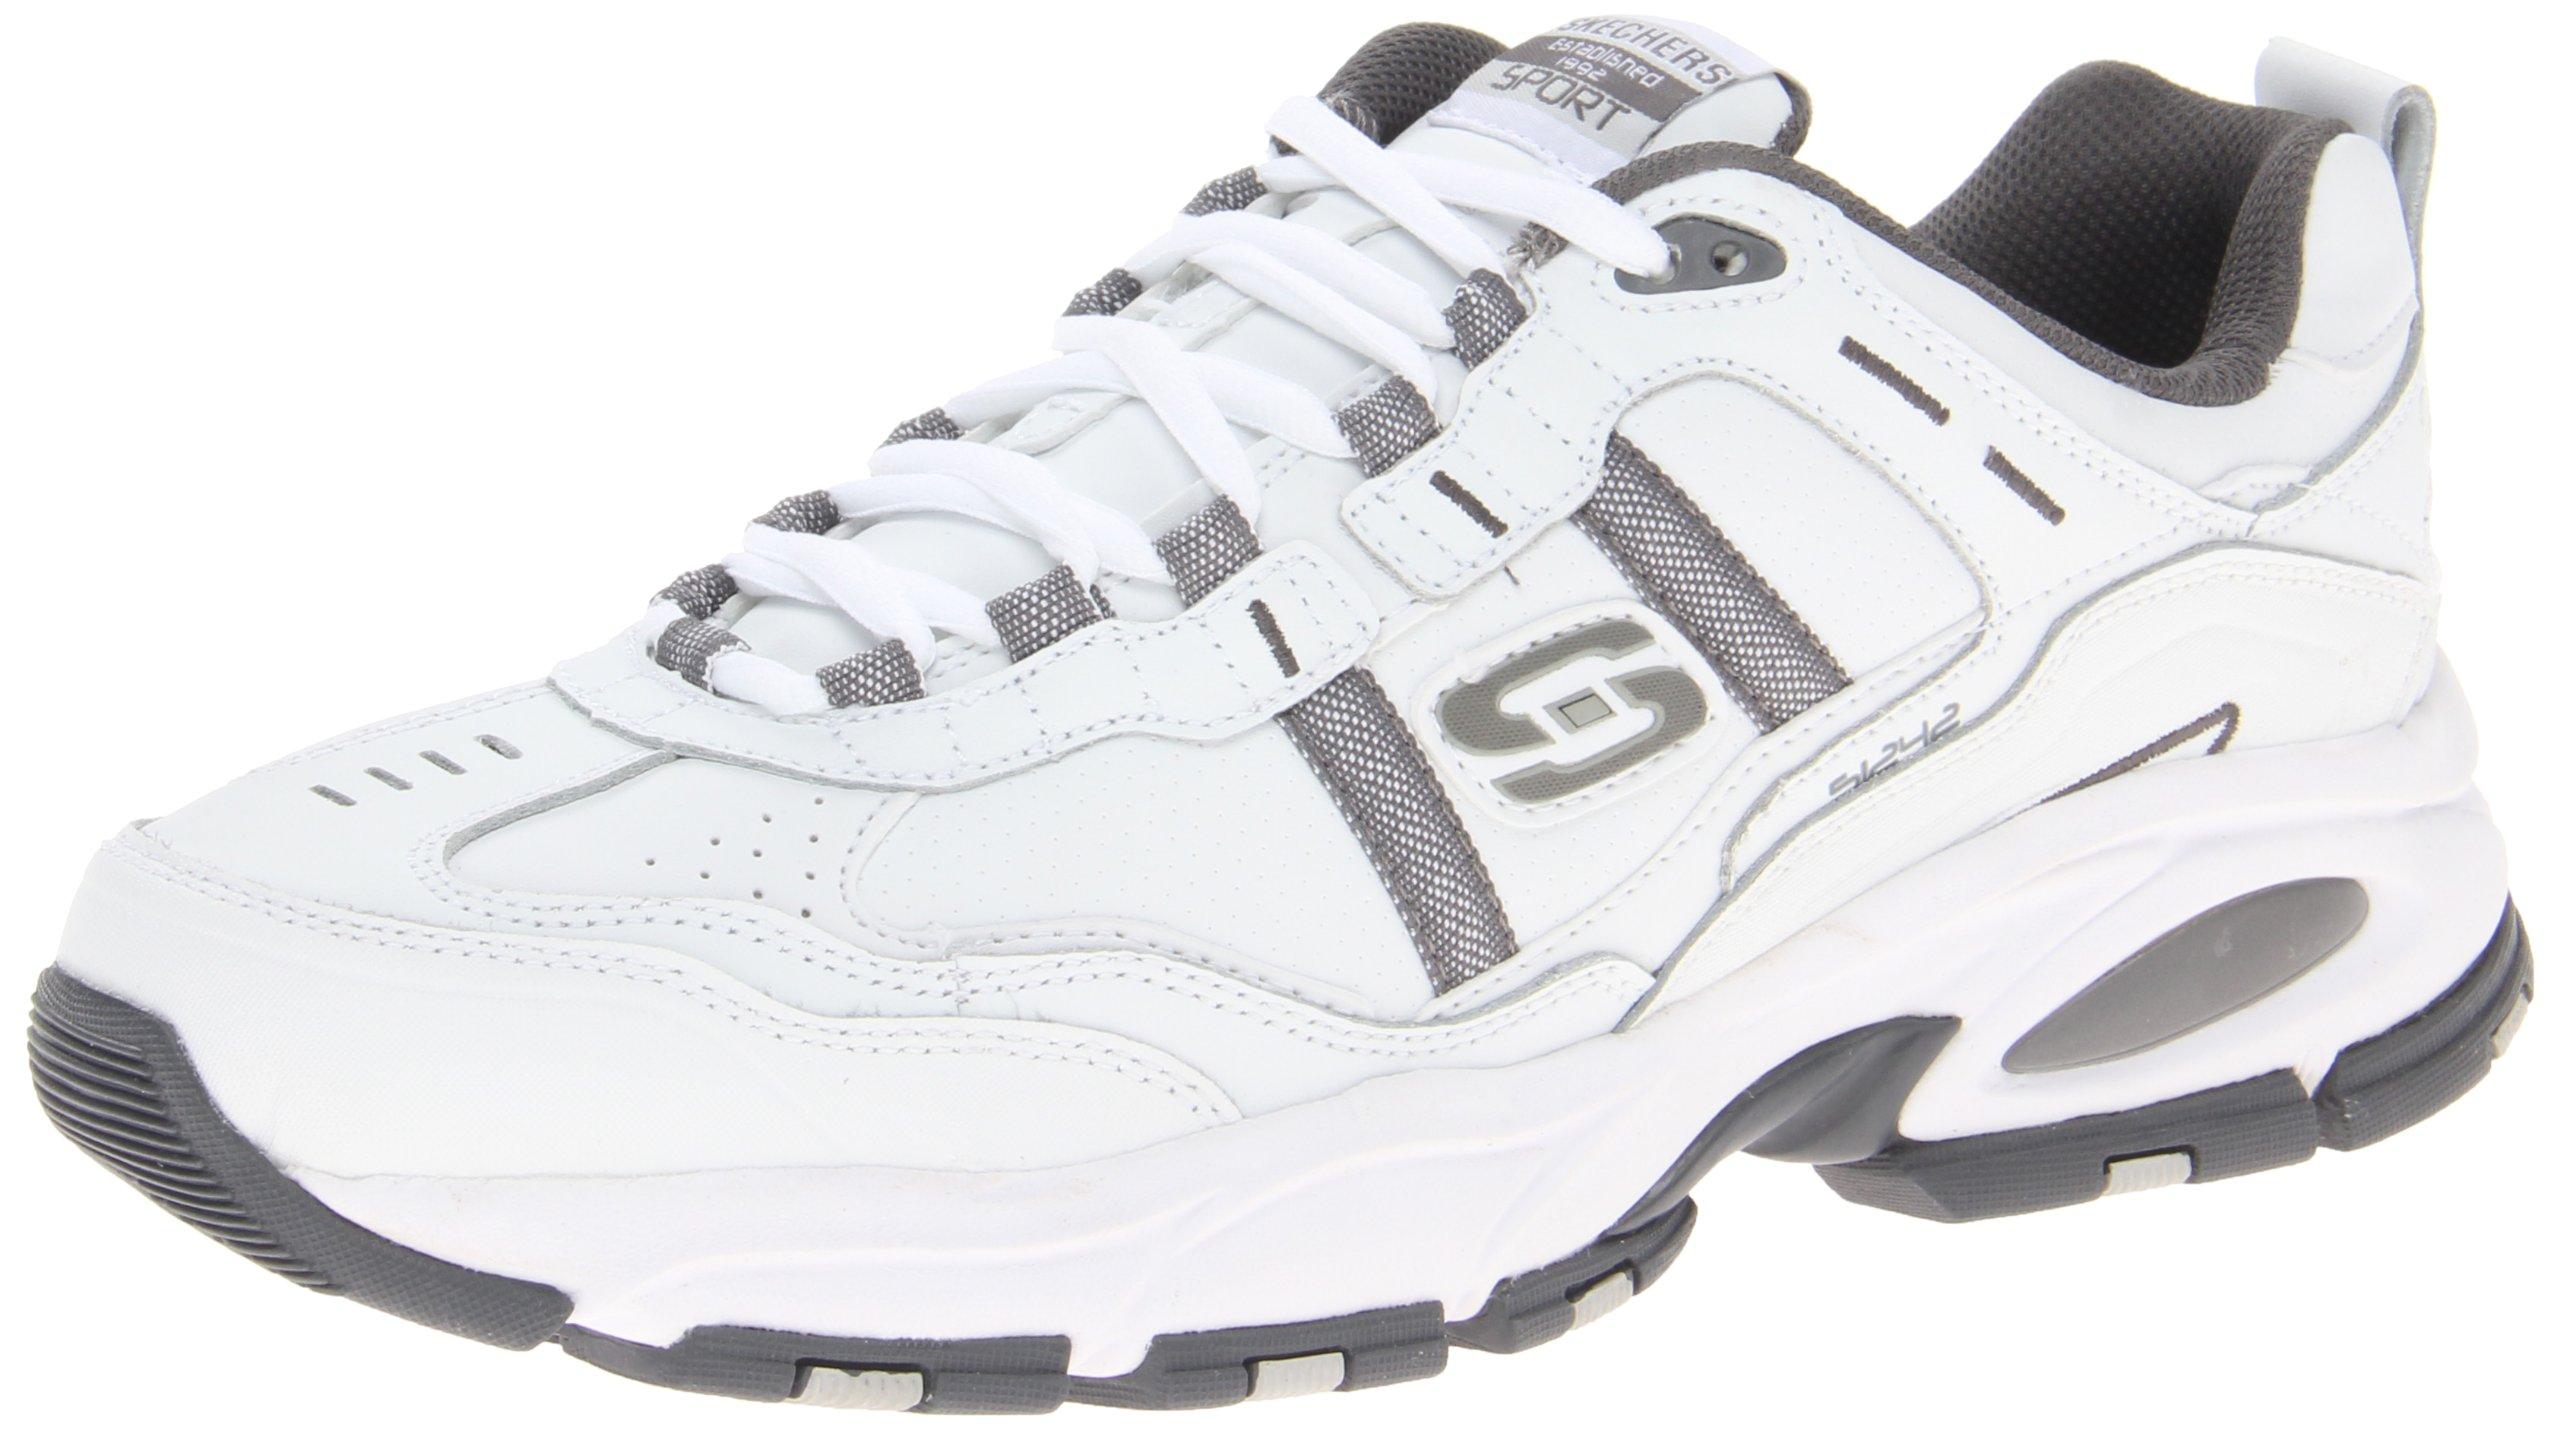 Skechers Sport Men's Vigor 2.0 Serpentine Memory Foam Sneaker,White/Charcoal,10 M US